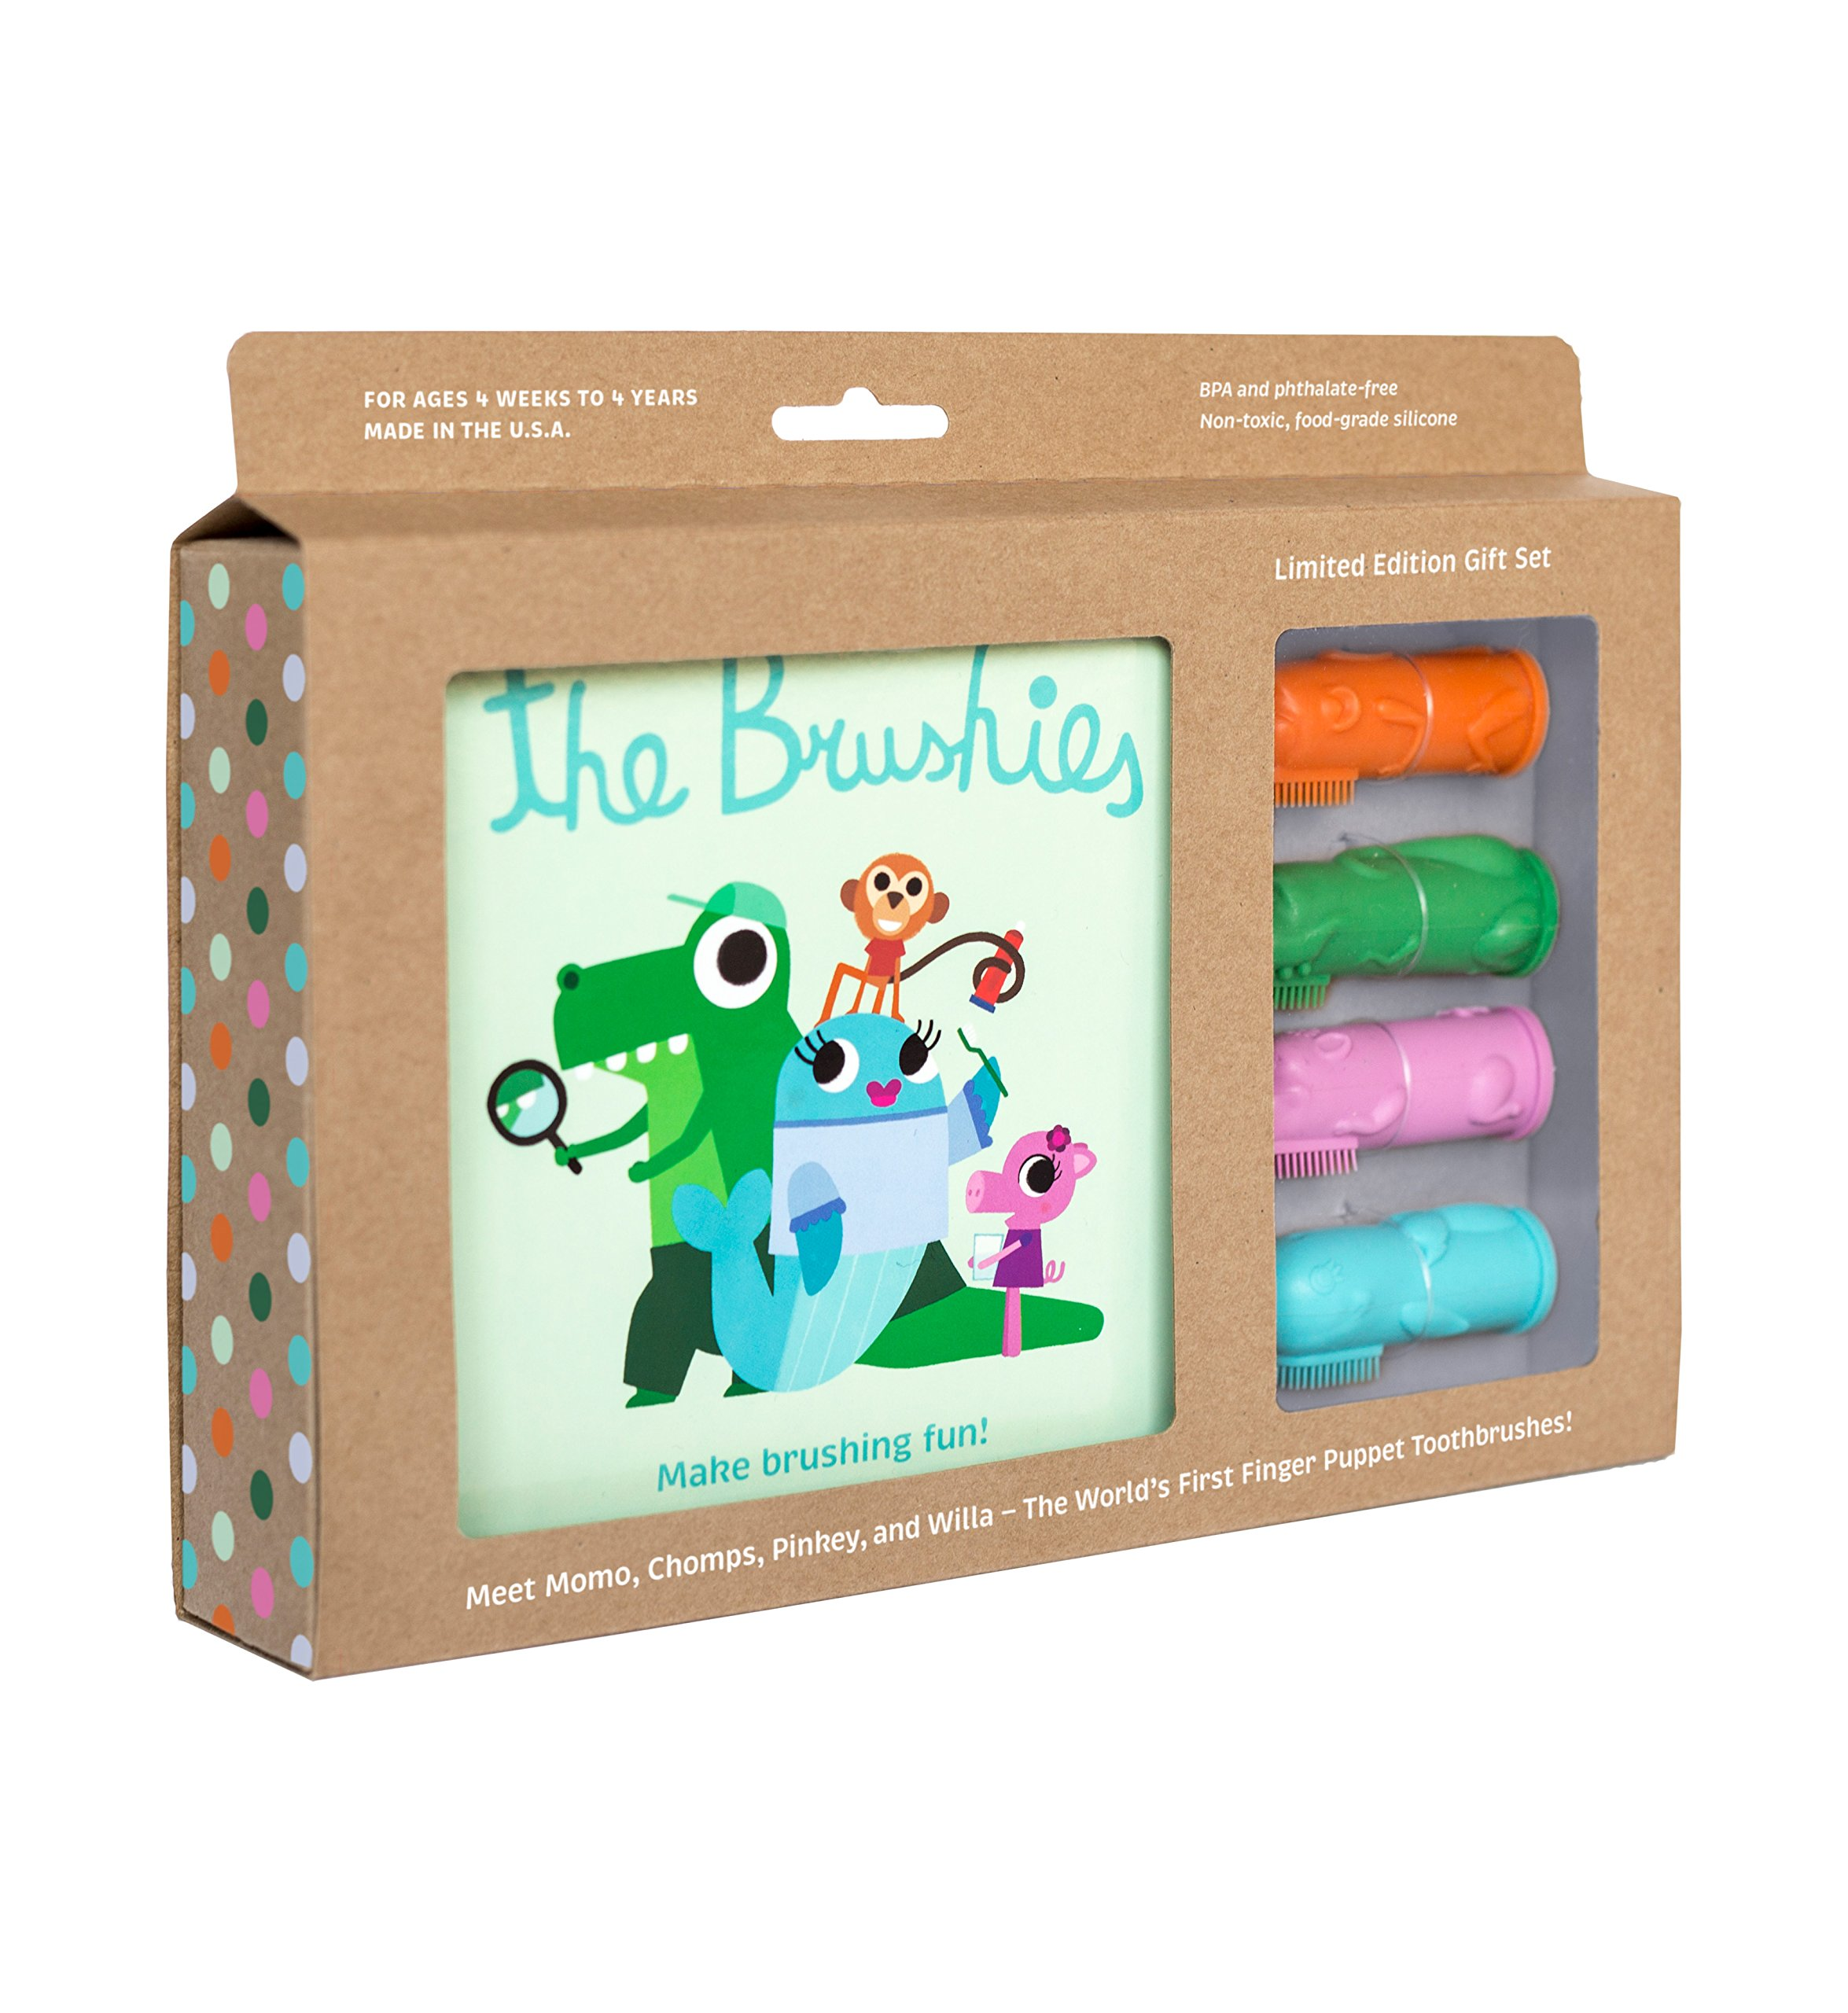 The Brushies Baby & Toddler Toothbrush & Storybook, Gift Set of 4 Brushes